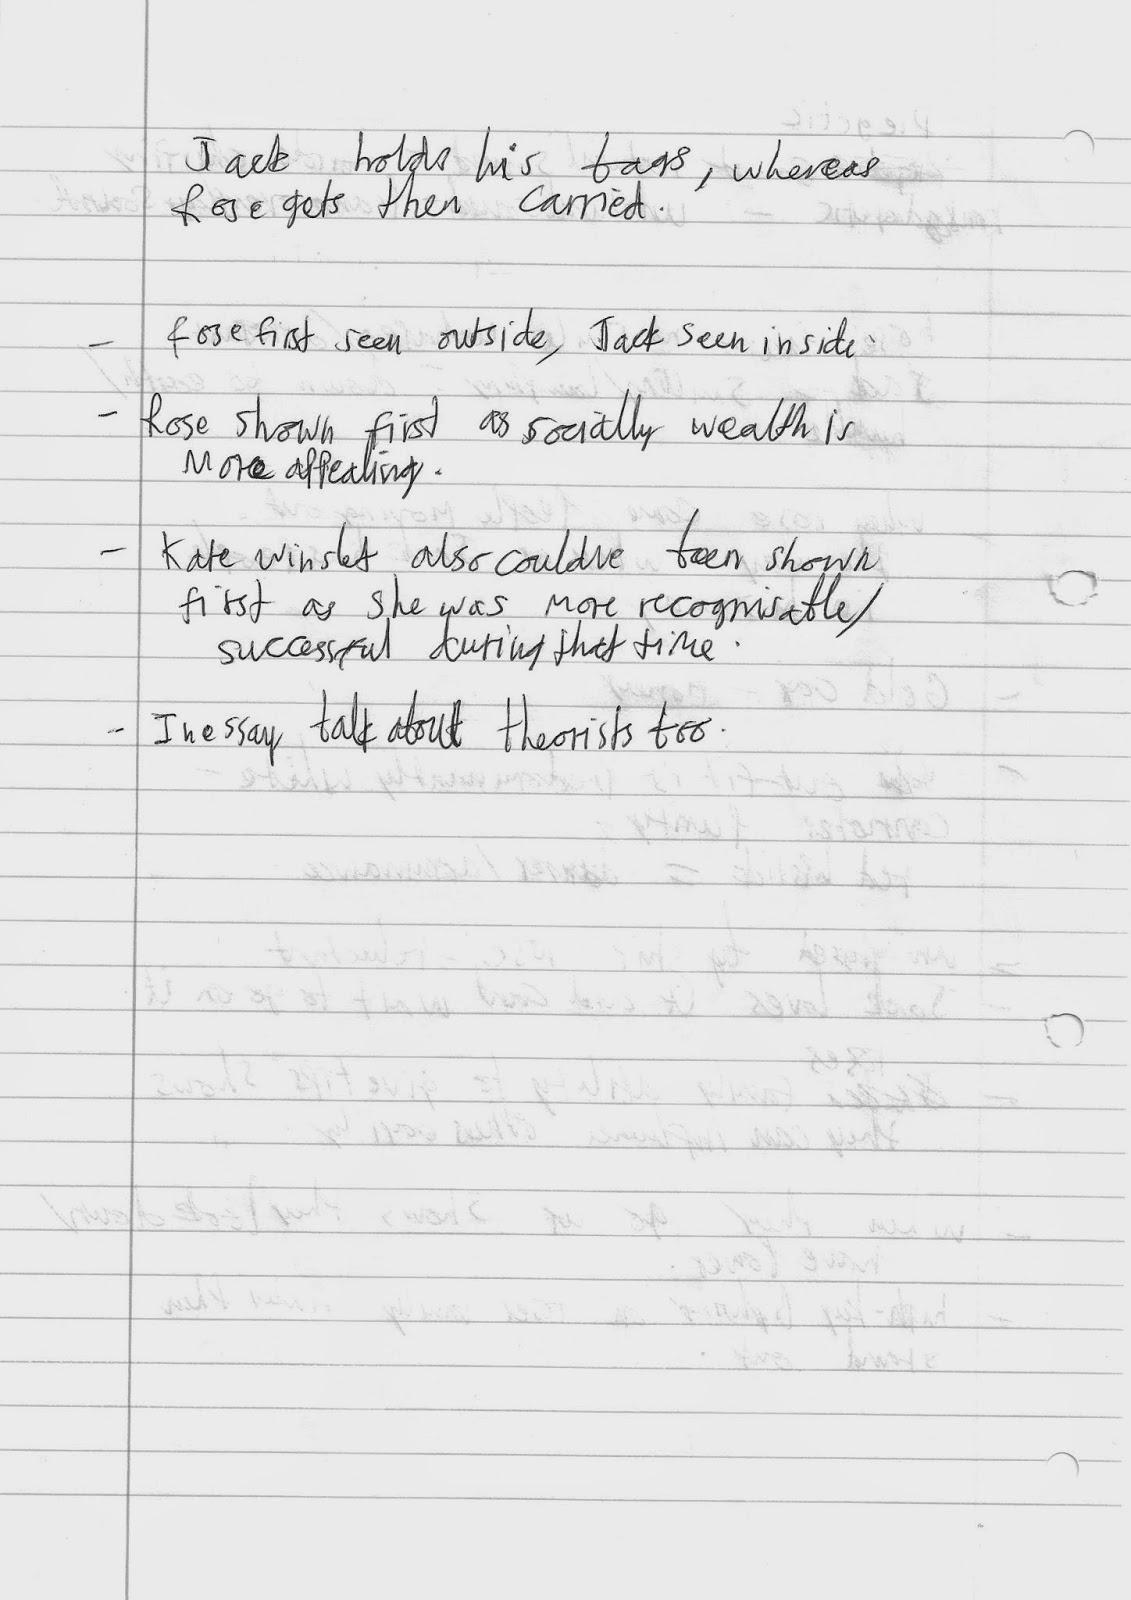 titanic essay sinking 91 121 113 106 titanic essay sinking